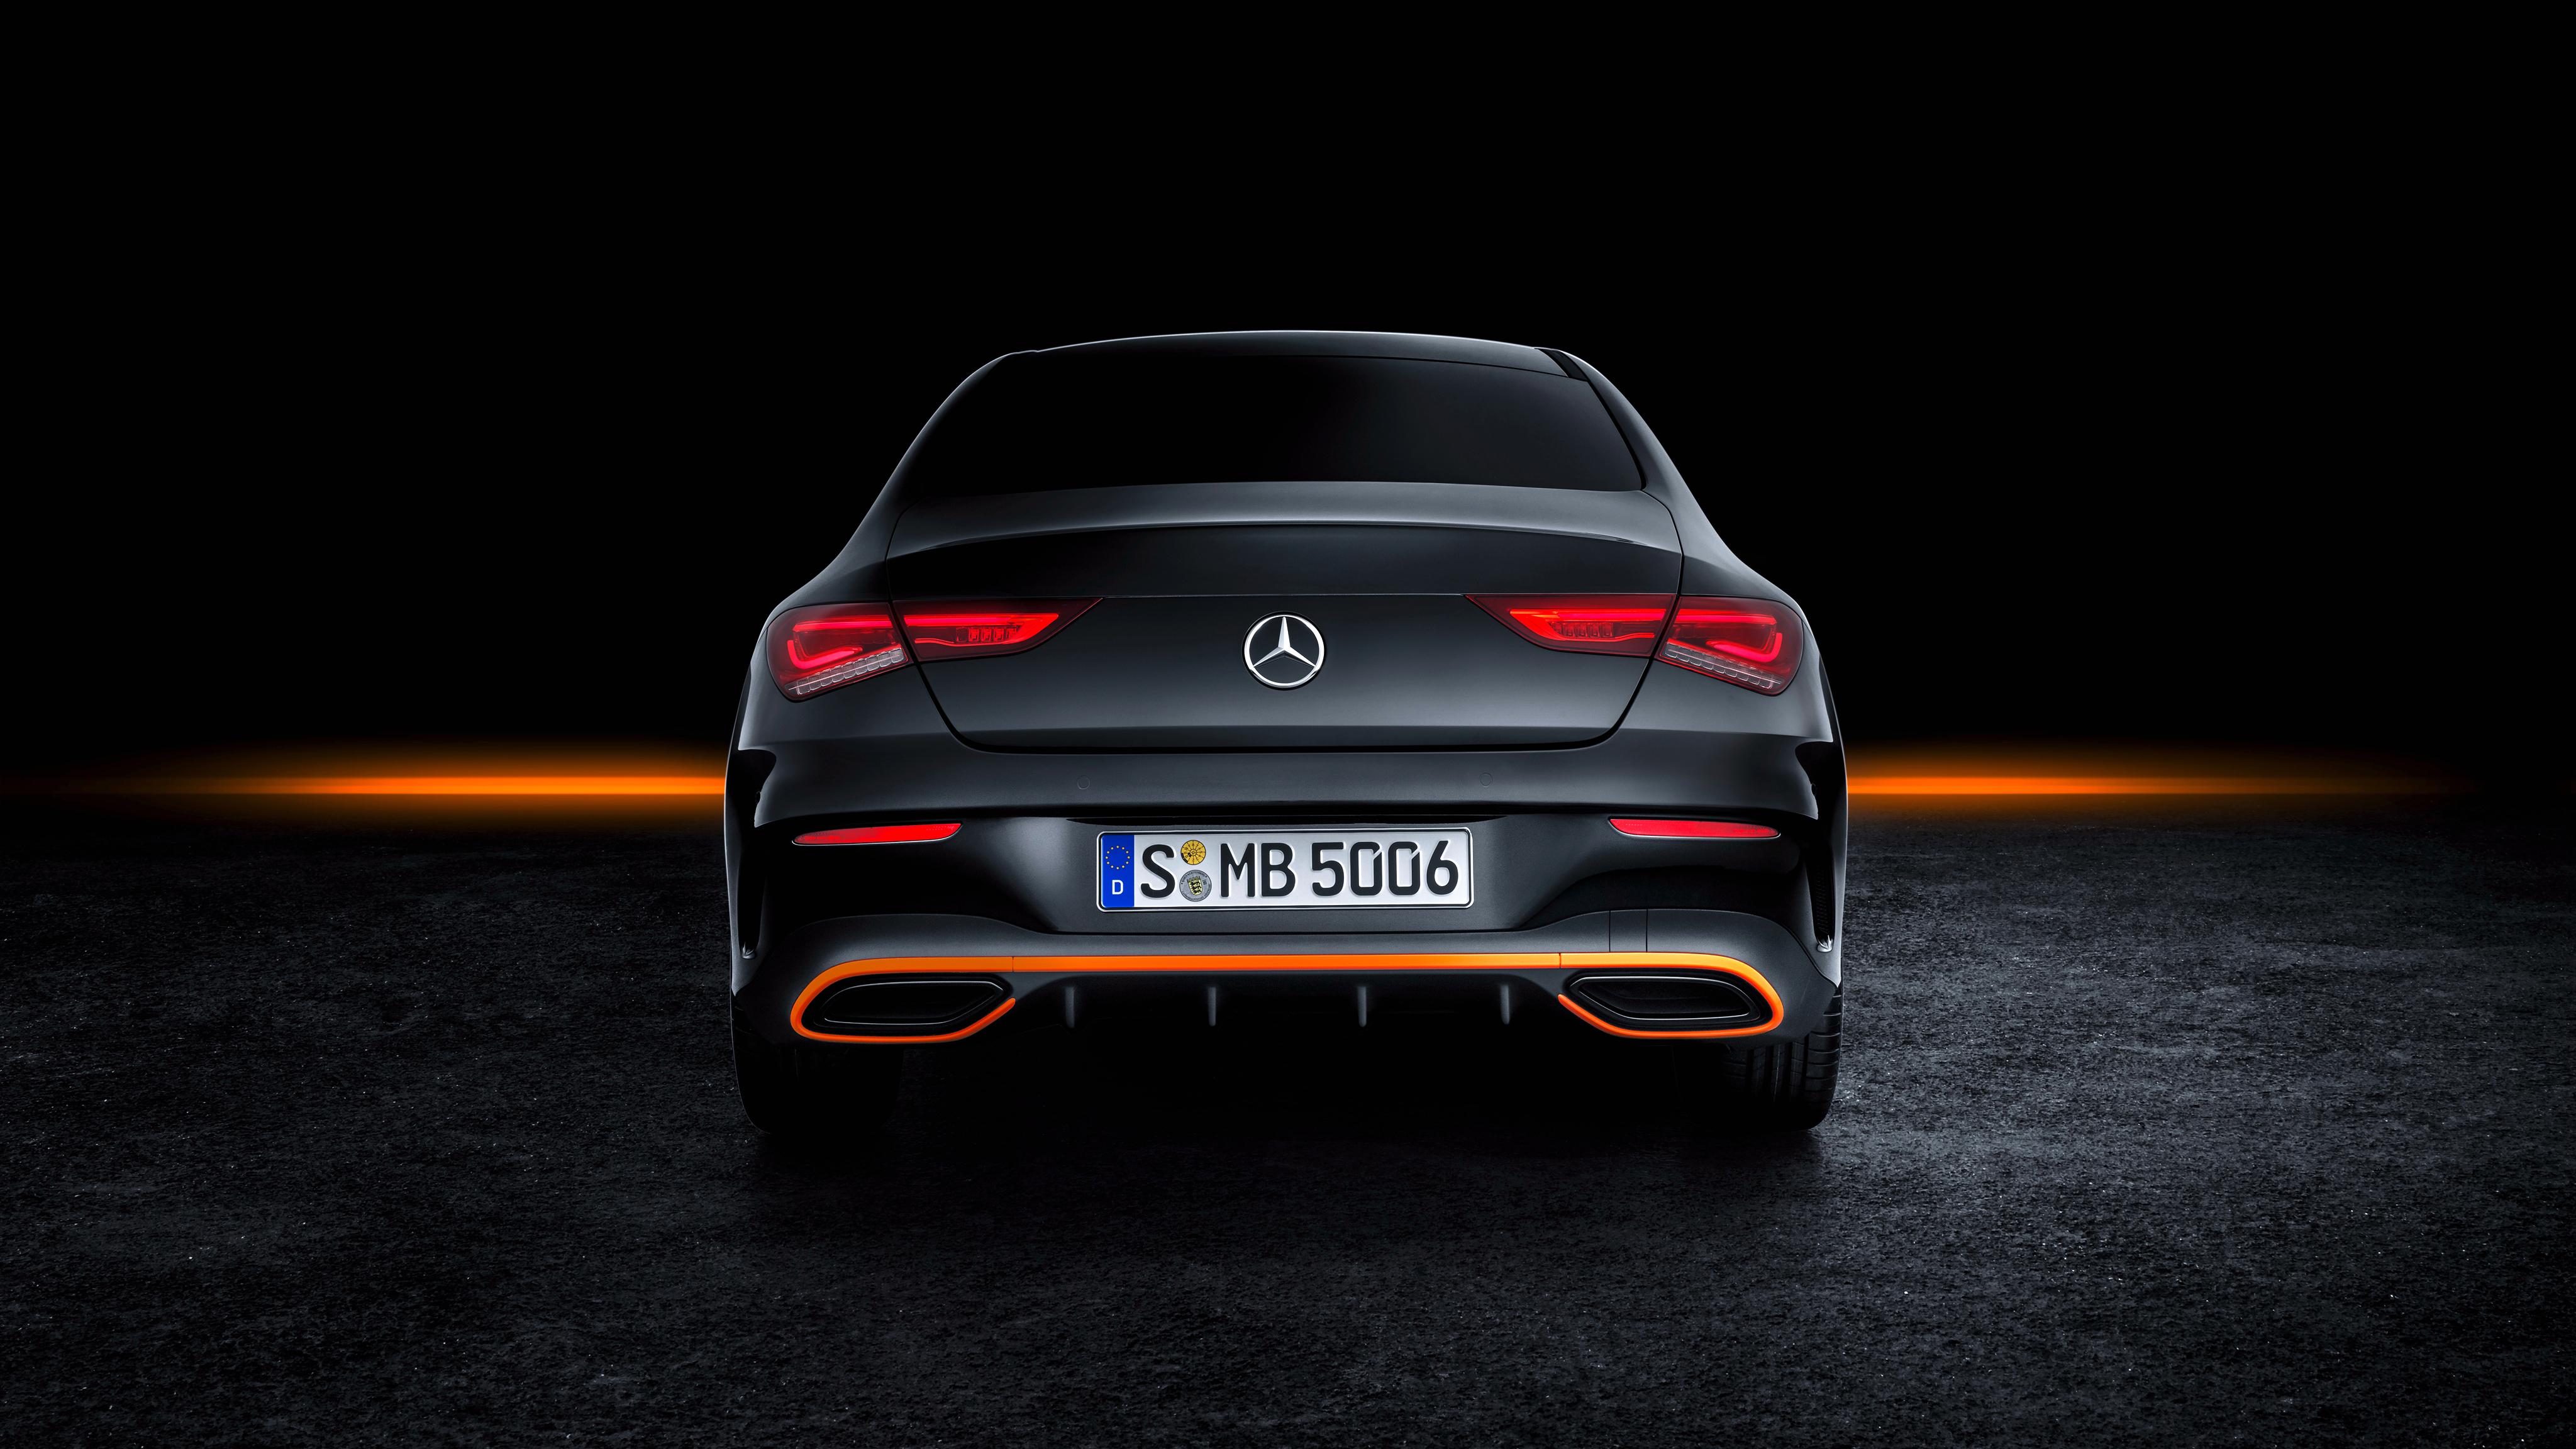 Mercedes benz Cla 250 Amg Line Edition Orange Art 2019   Mercedes 4096x2304